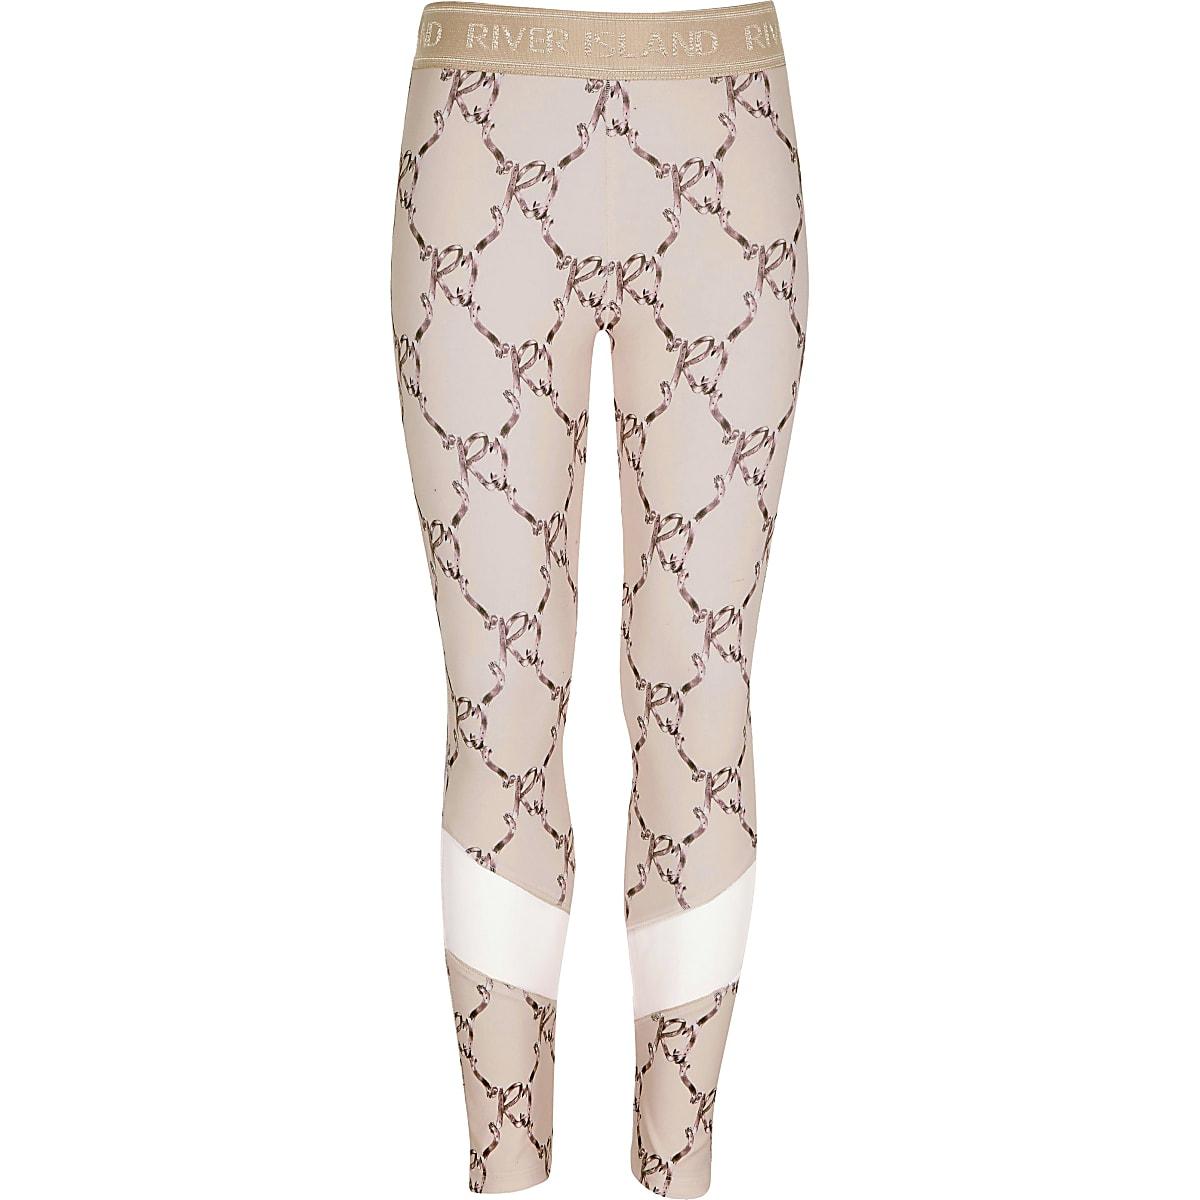 Girls RI Active pink bow leggings